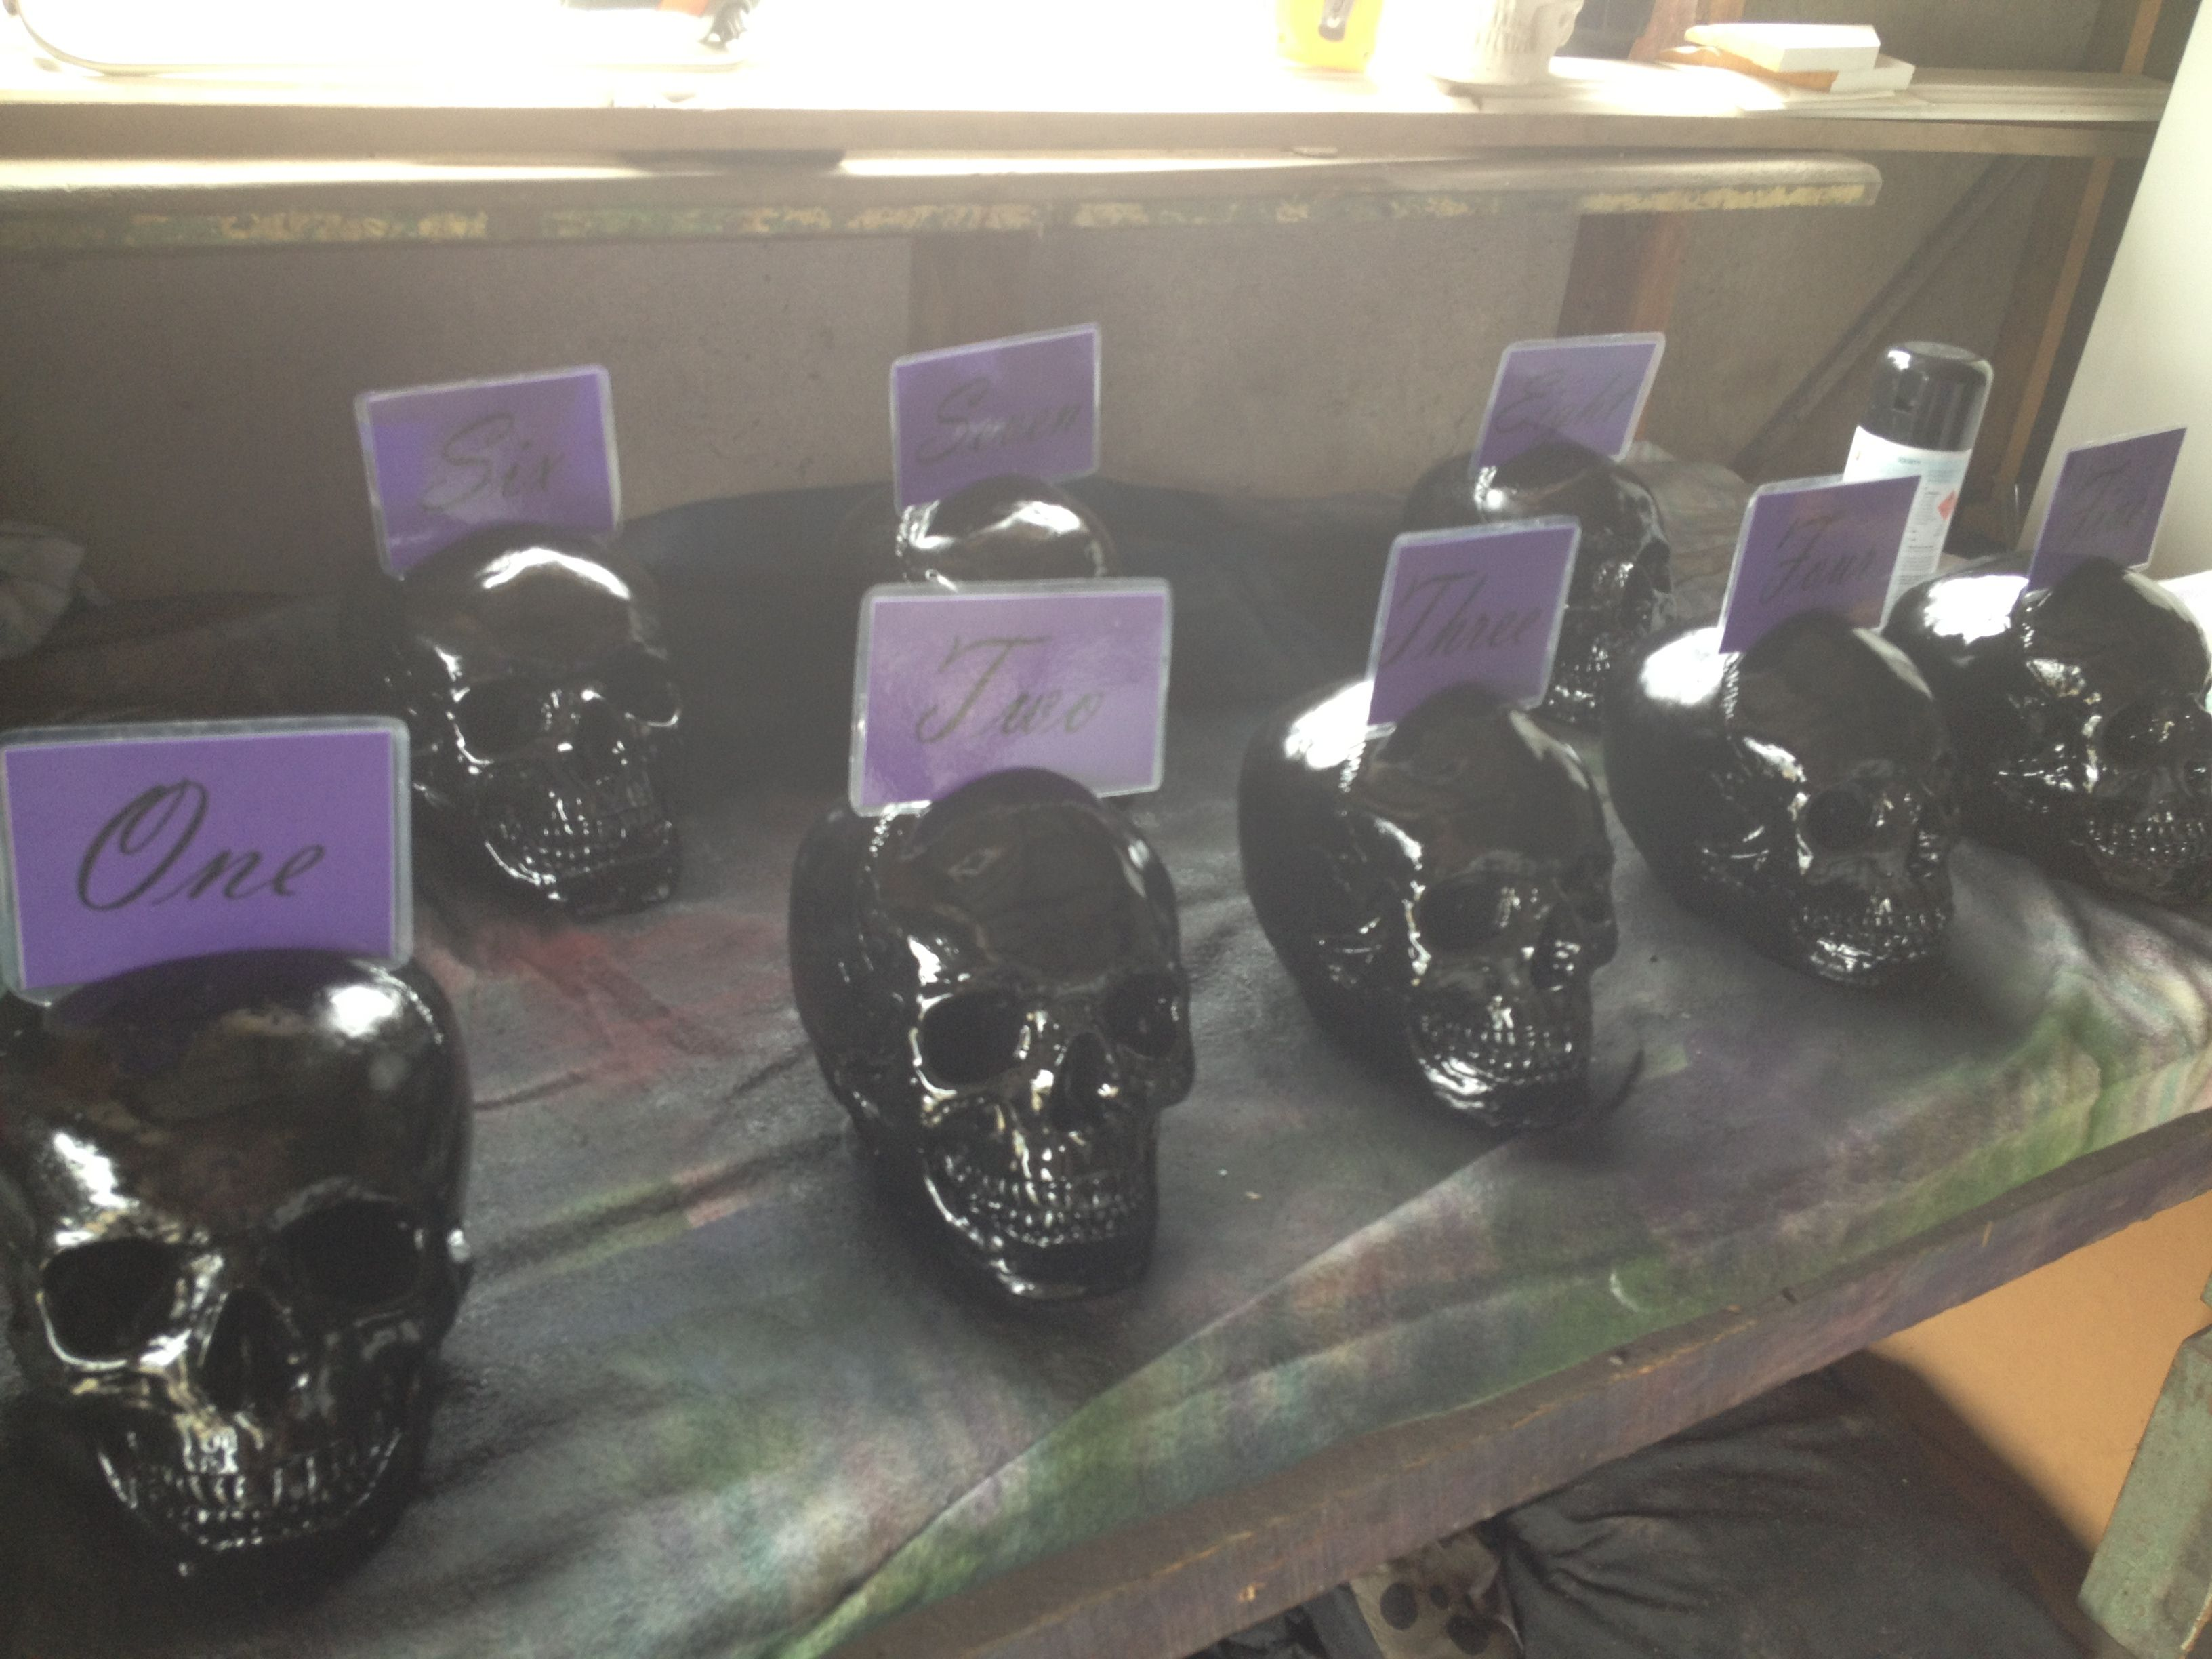 best 20 horror wedding ideas on pinterest skull wedding halloween wedding centerpieces and halloween centerpieces